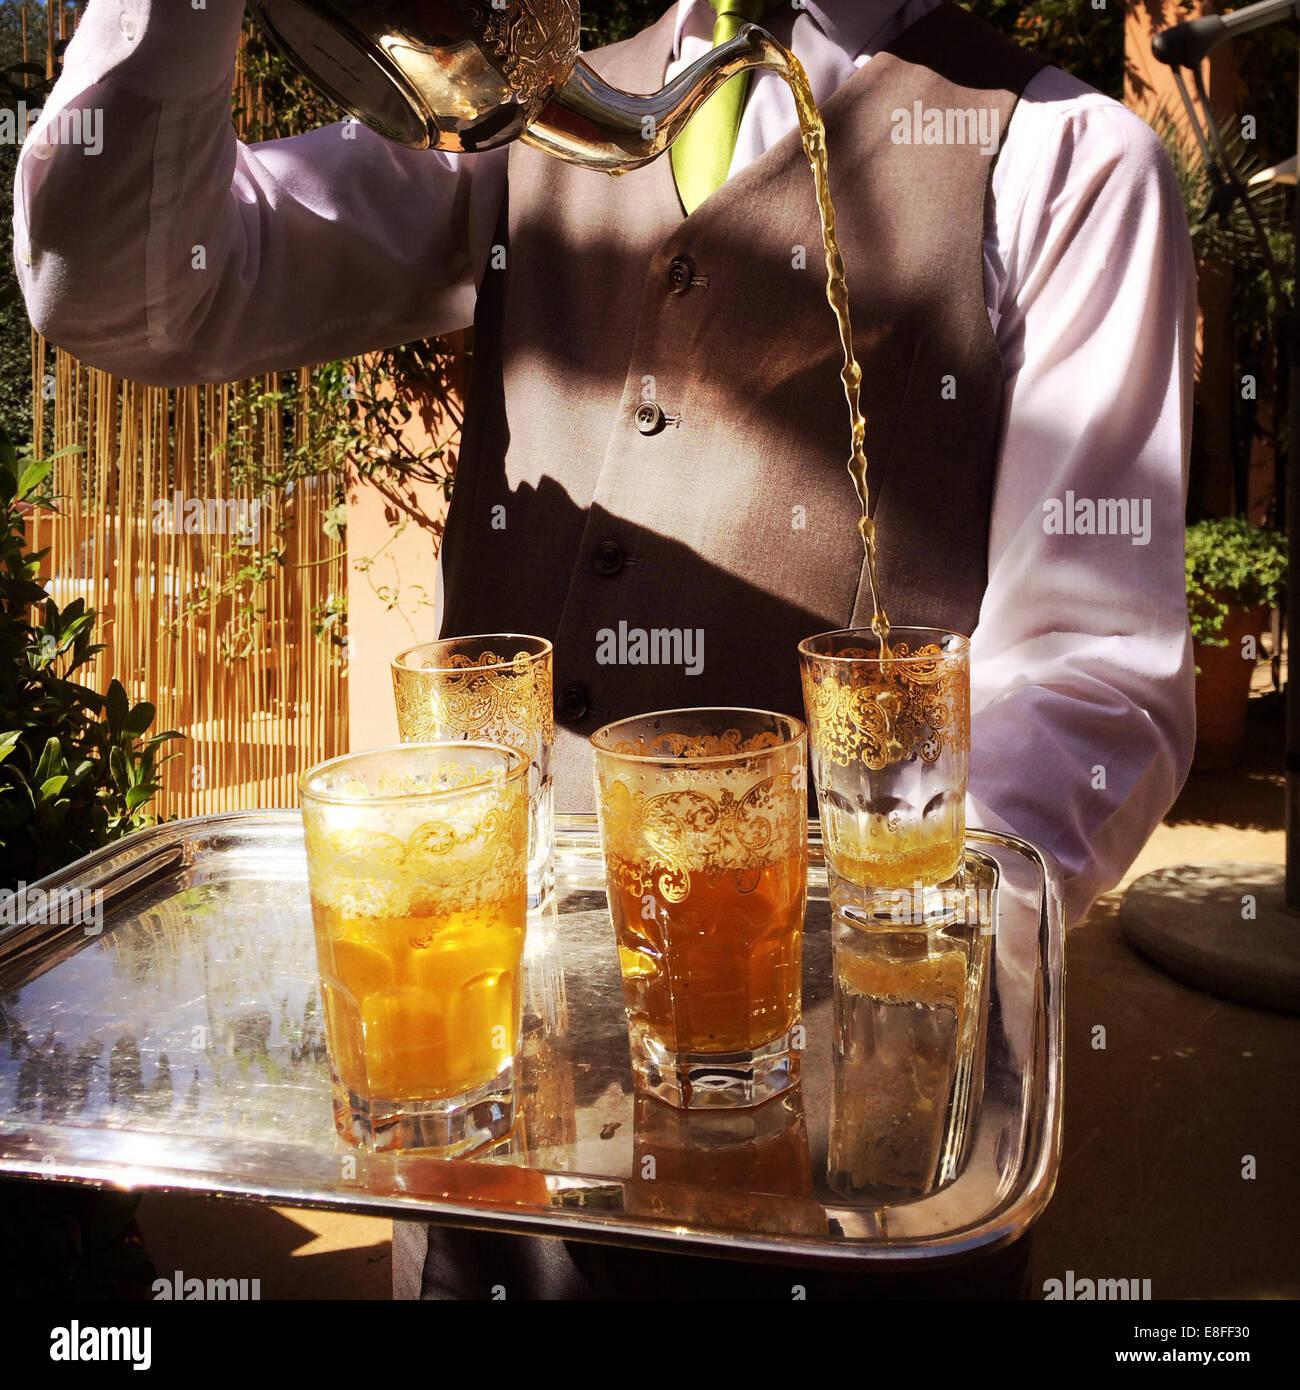 Morocco, Marrakesh, Waiter pouring tea during tea ceremony - Stock Image